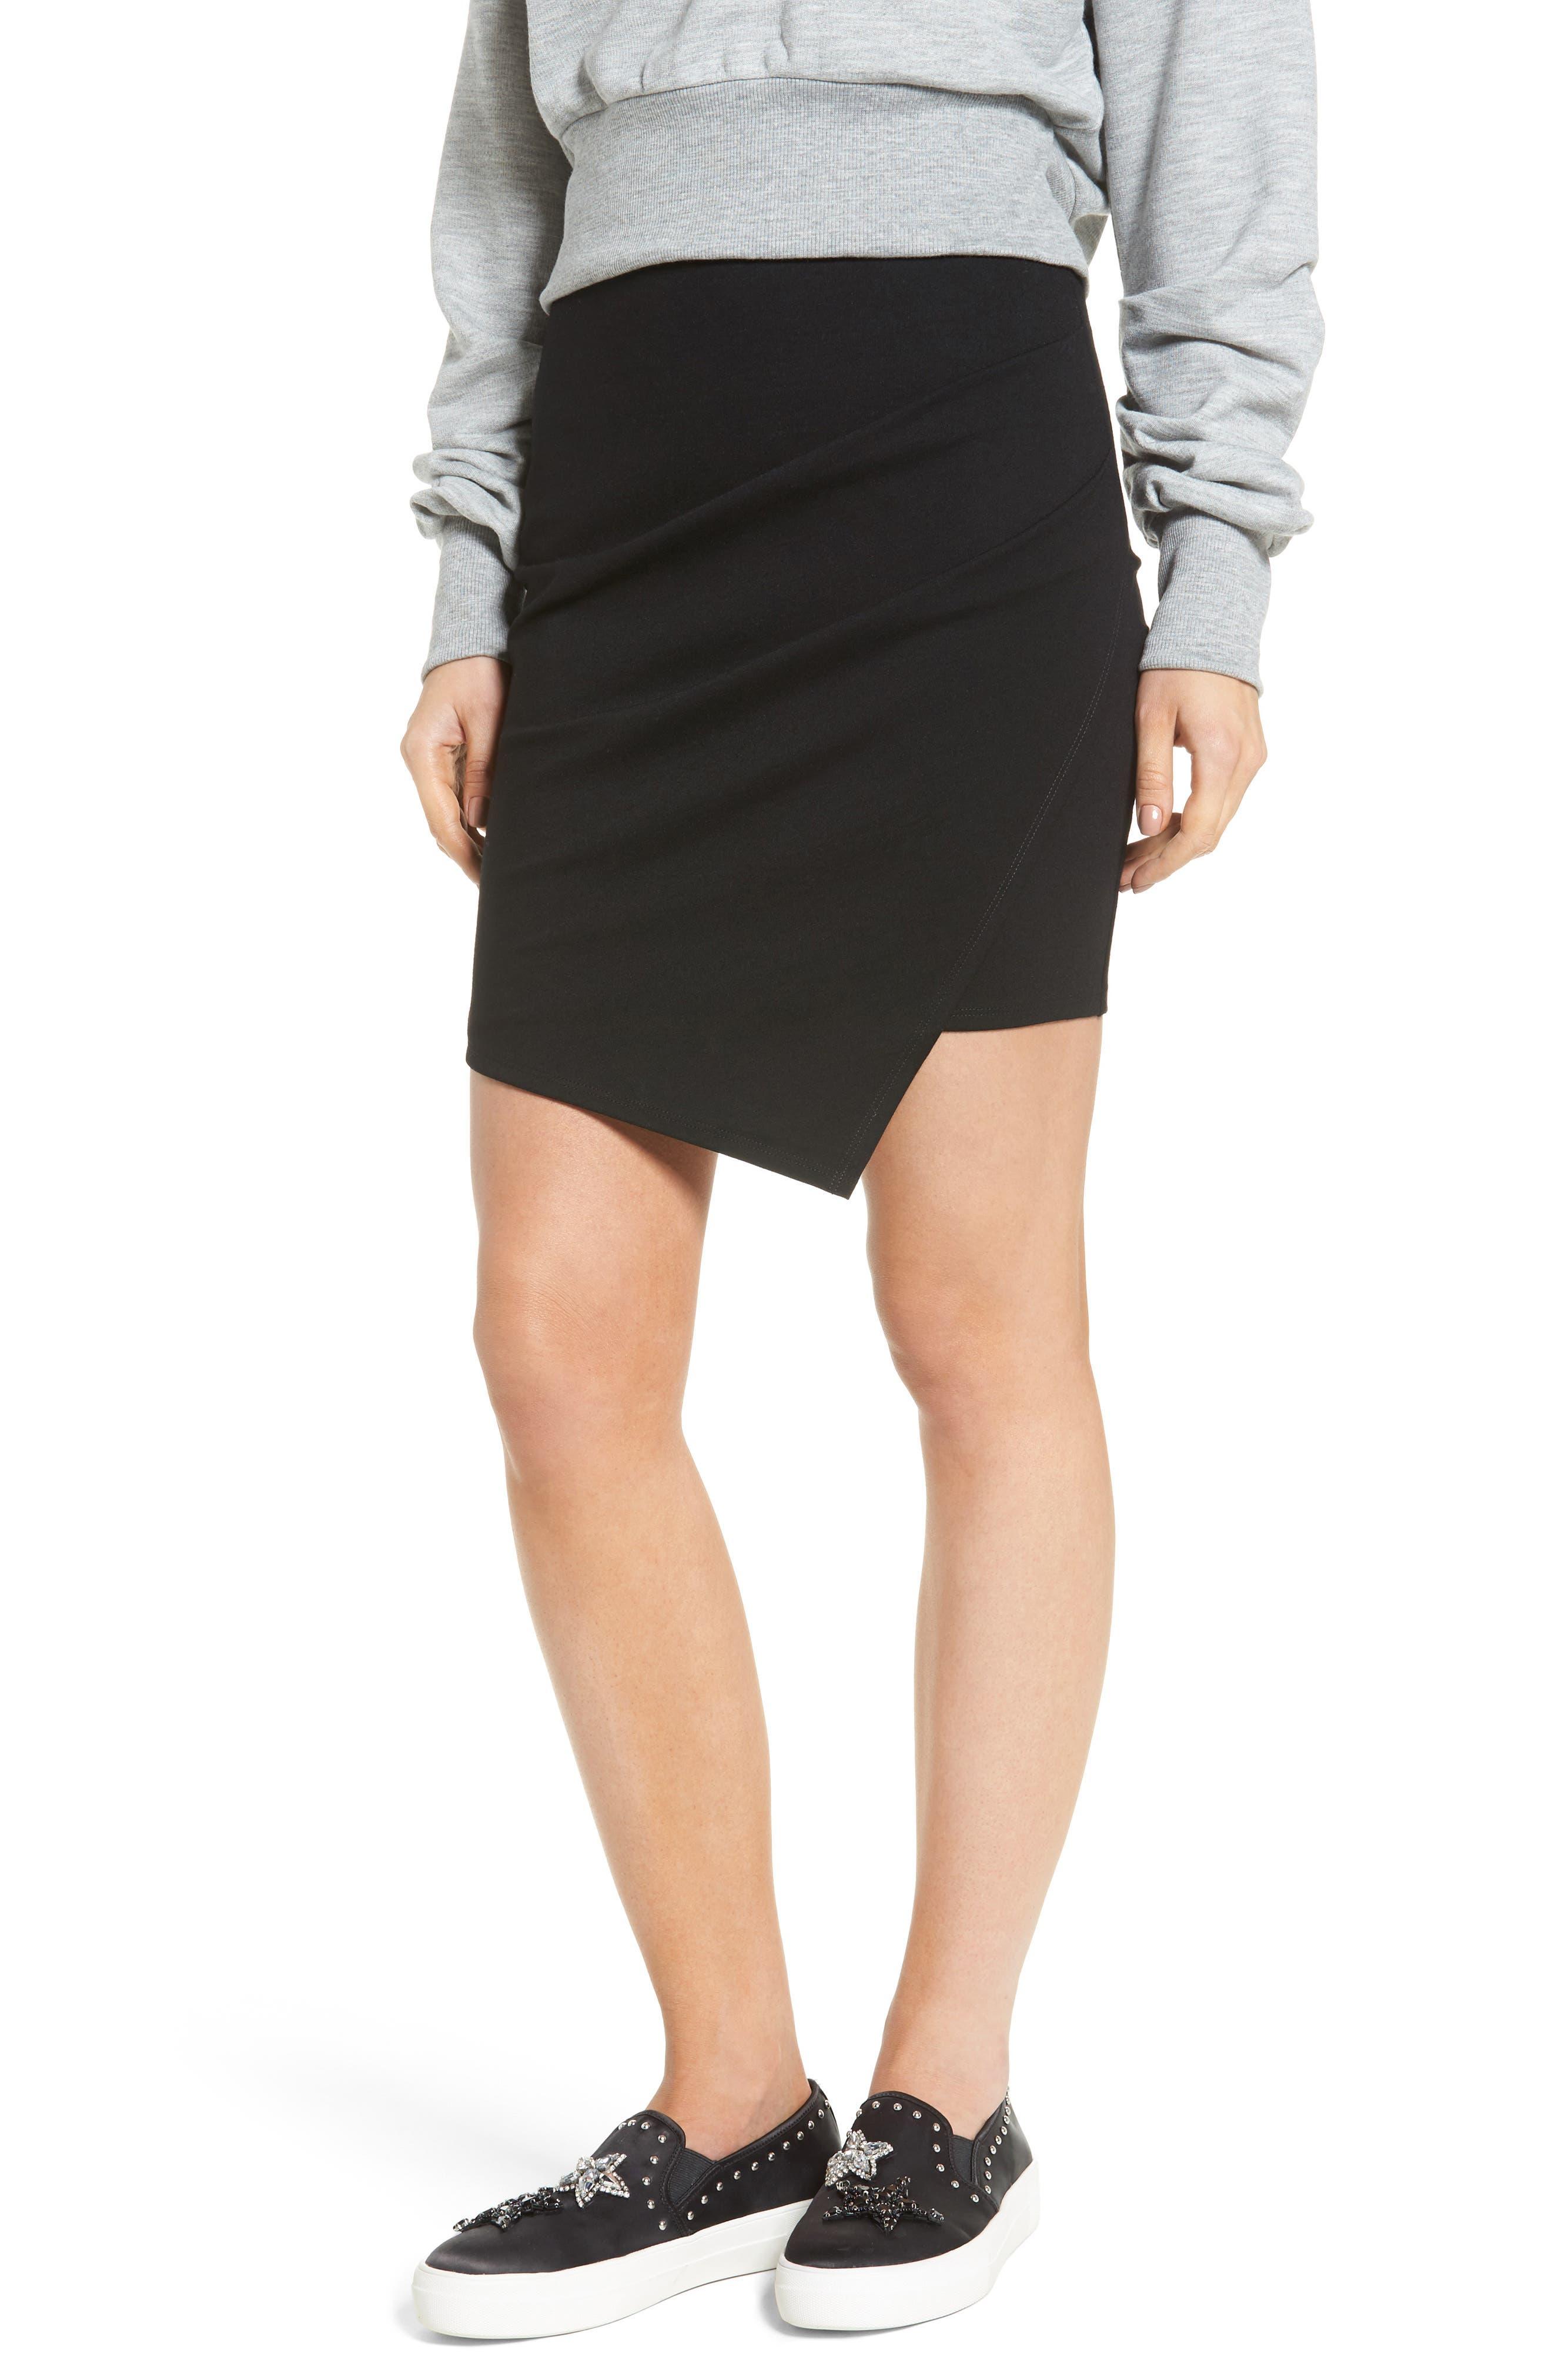 Soprano Cross Front Miniskirt